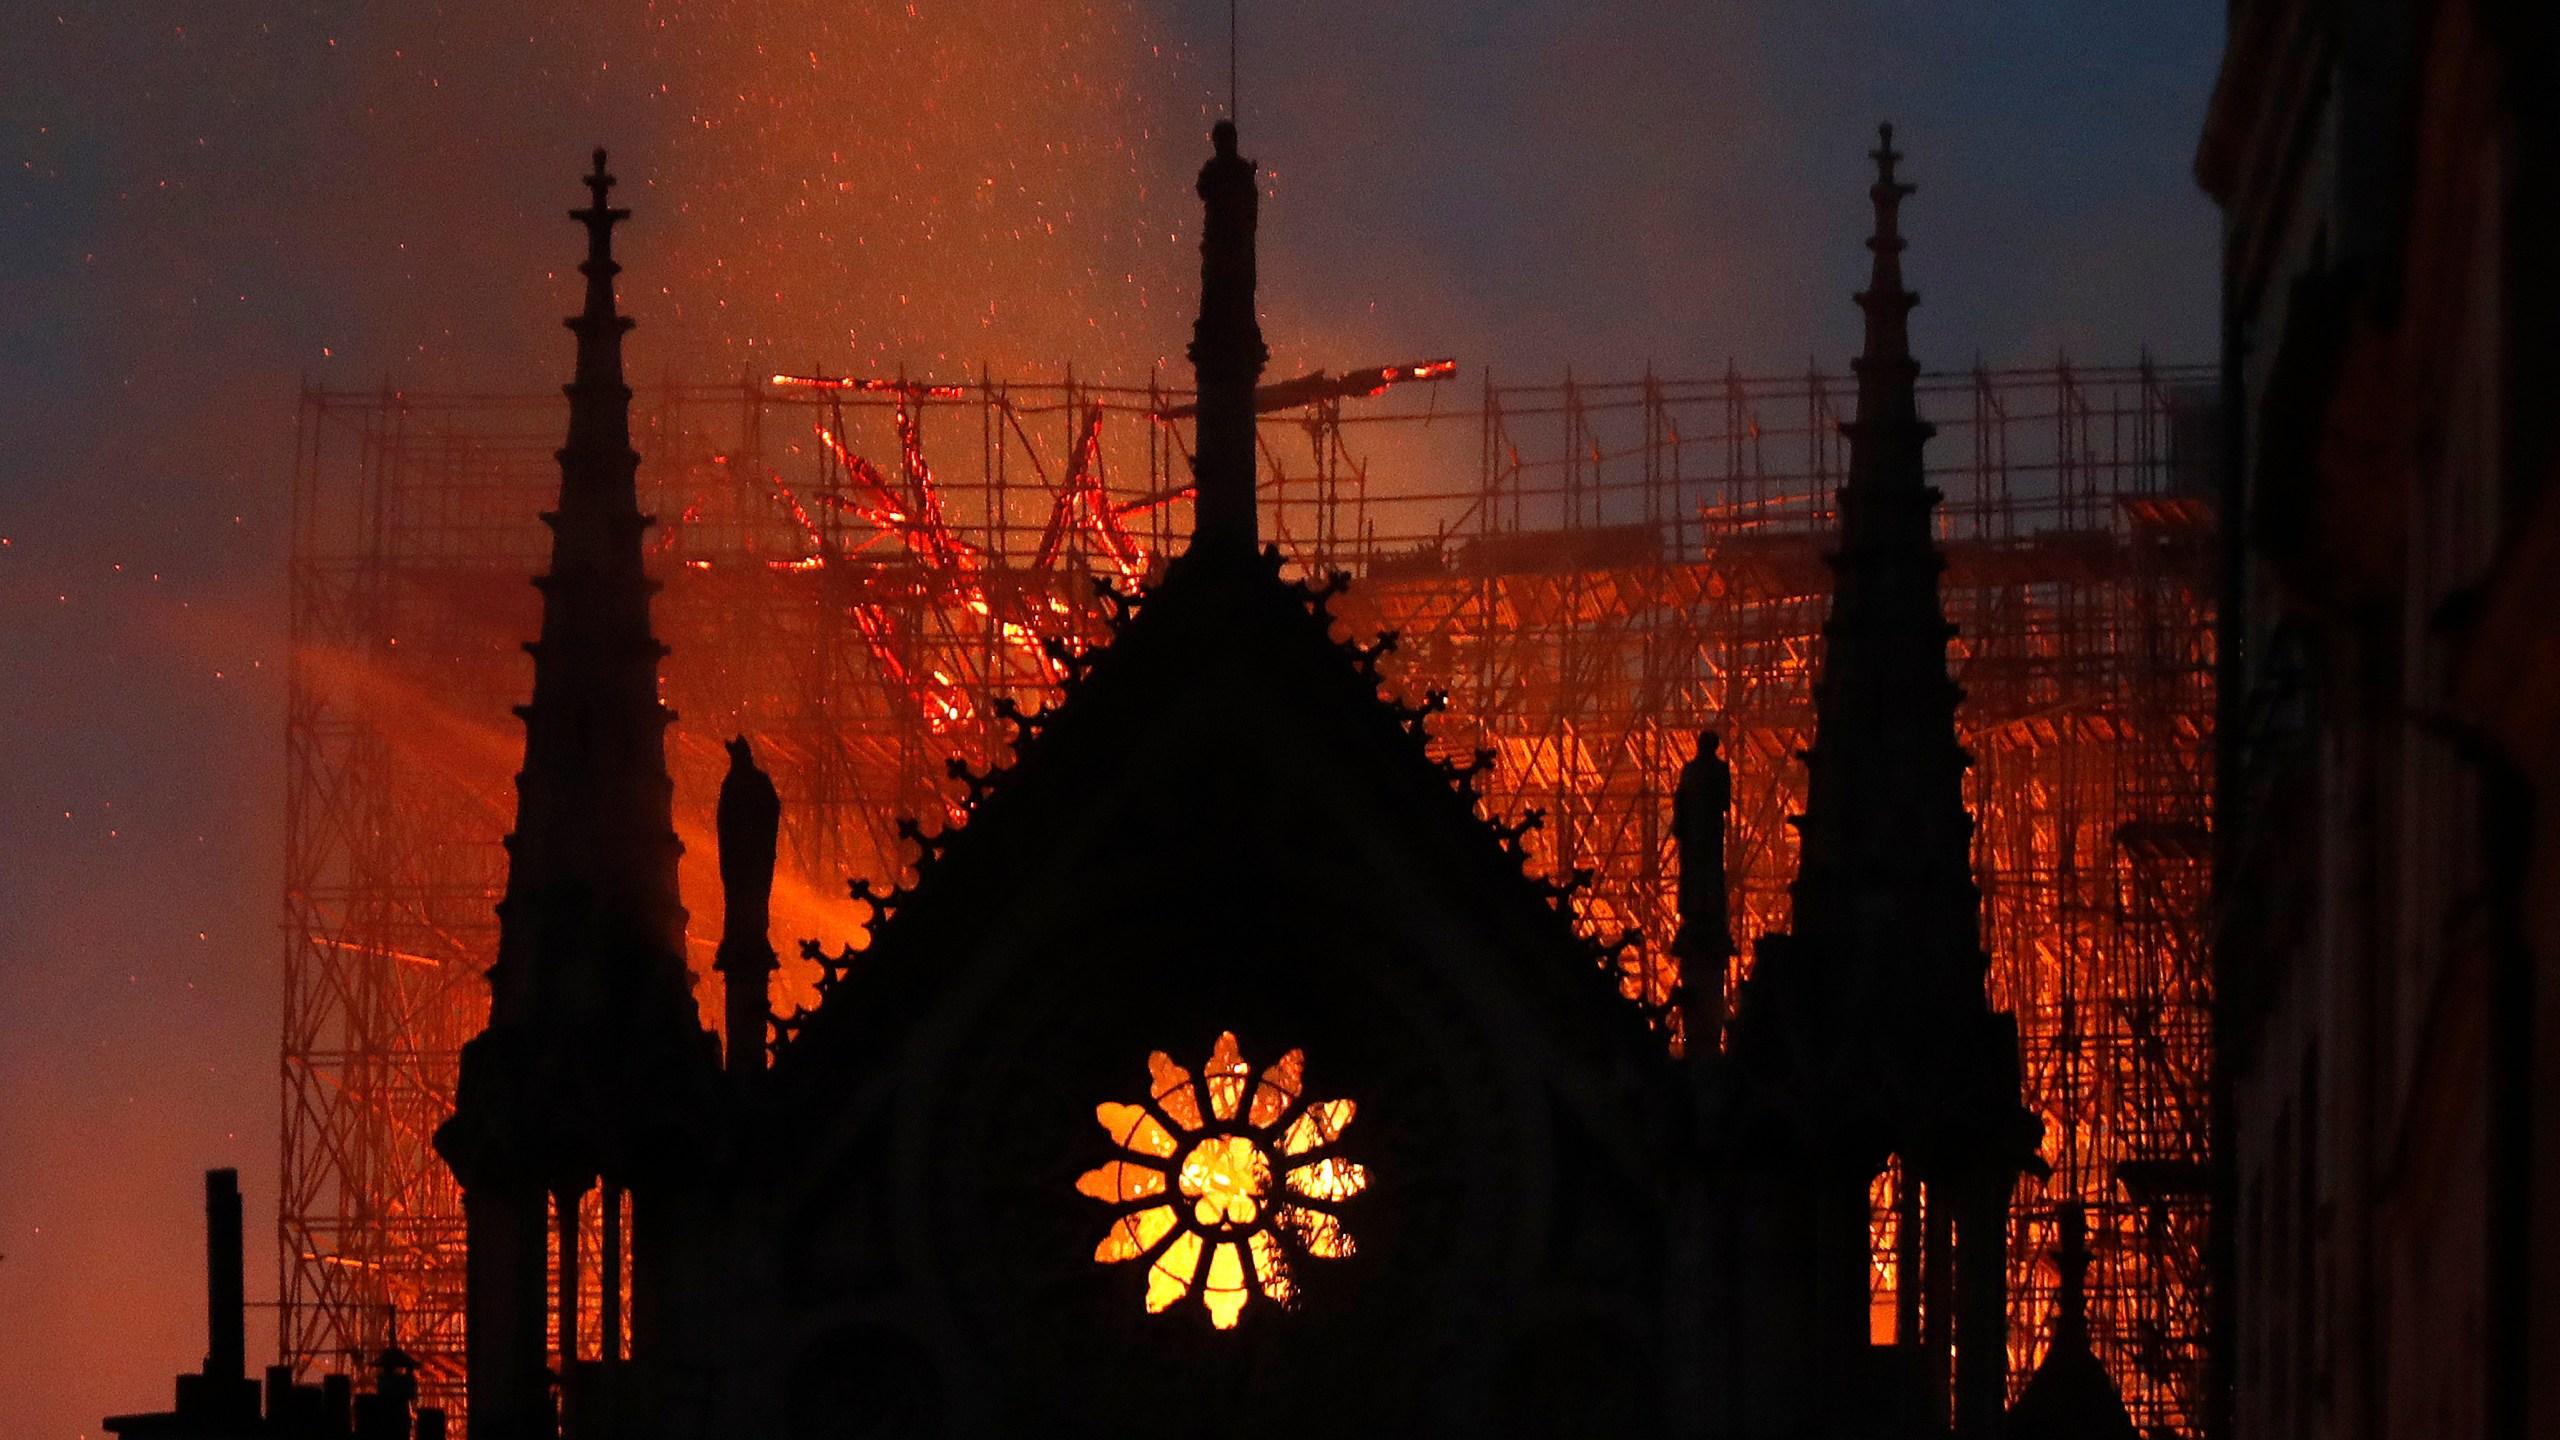 APTOPIX_France_Notre_Dame_Fire_68392-159532.jpg47513516